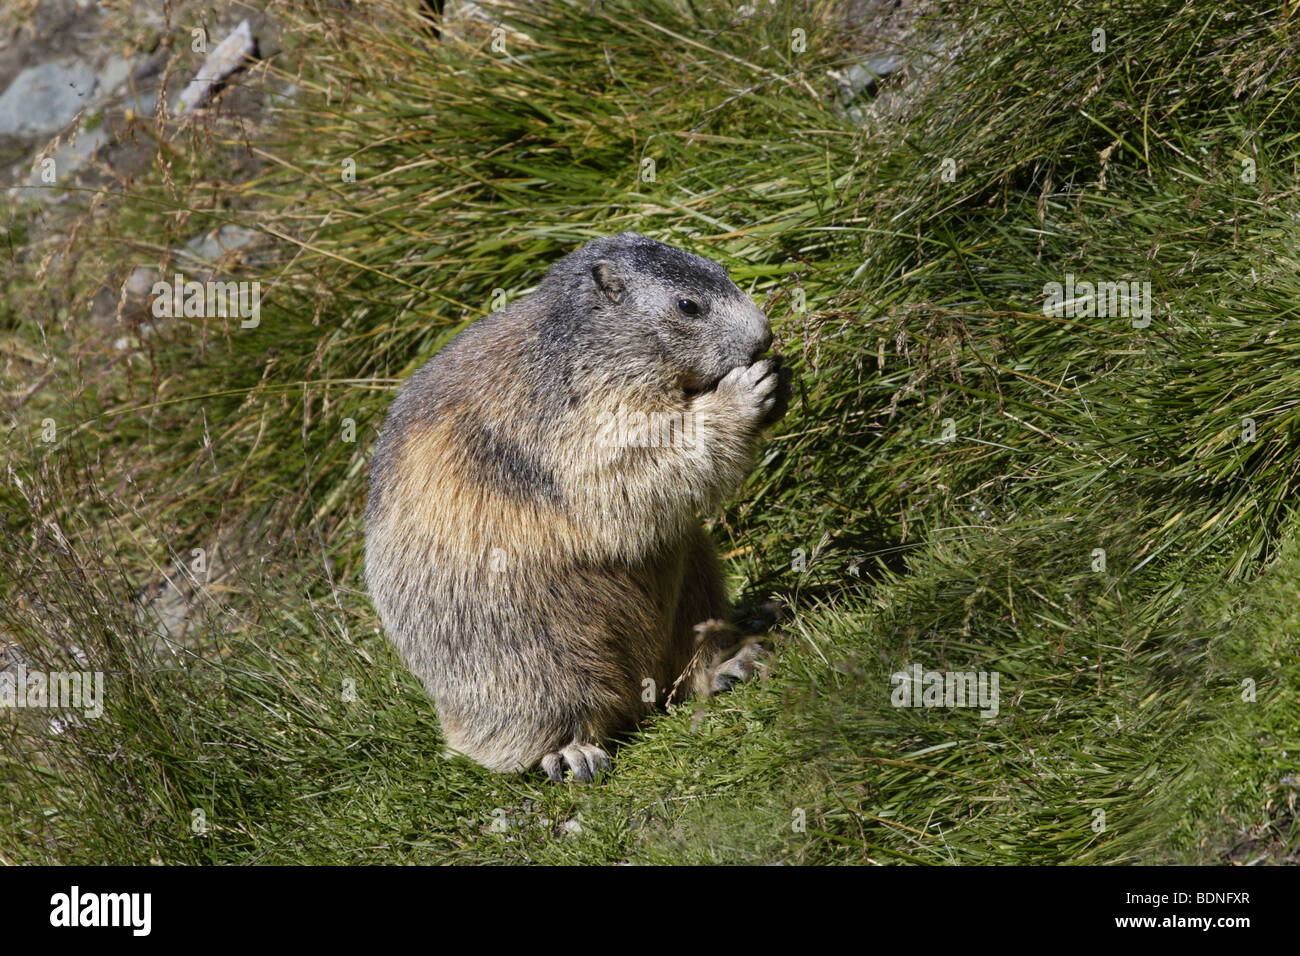 Alpenmurmeltier (Marmots marmota) alpine marmot - Stock Image